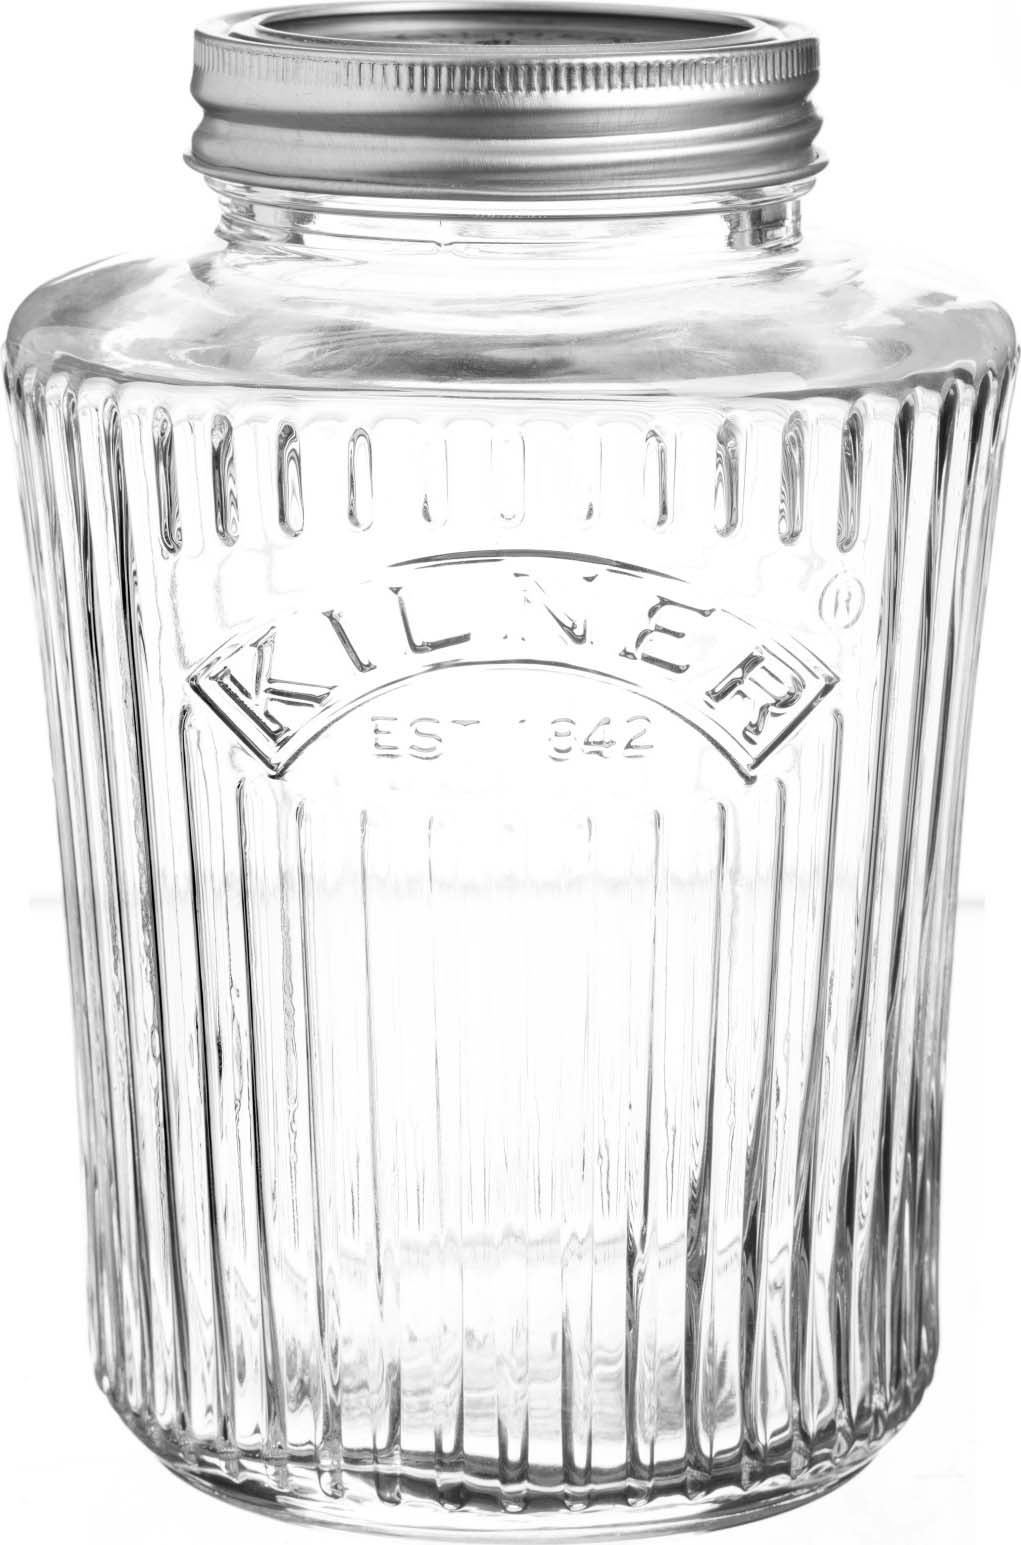 Банка для консервирования Kilner Vintage, 1 л